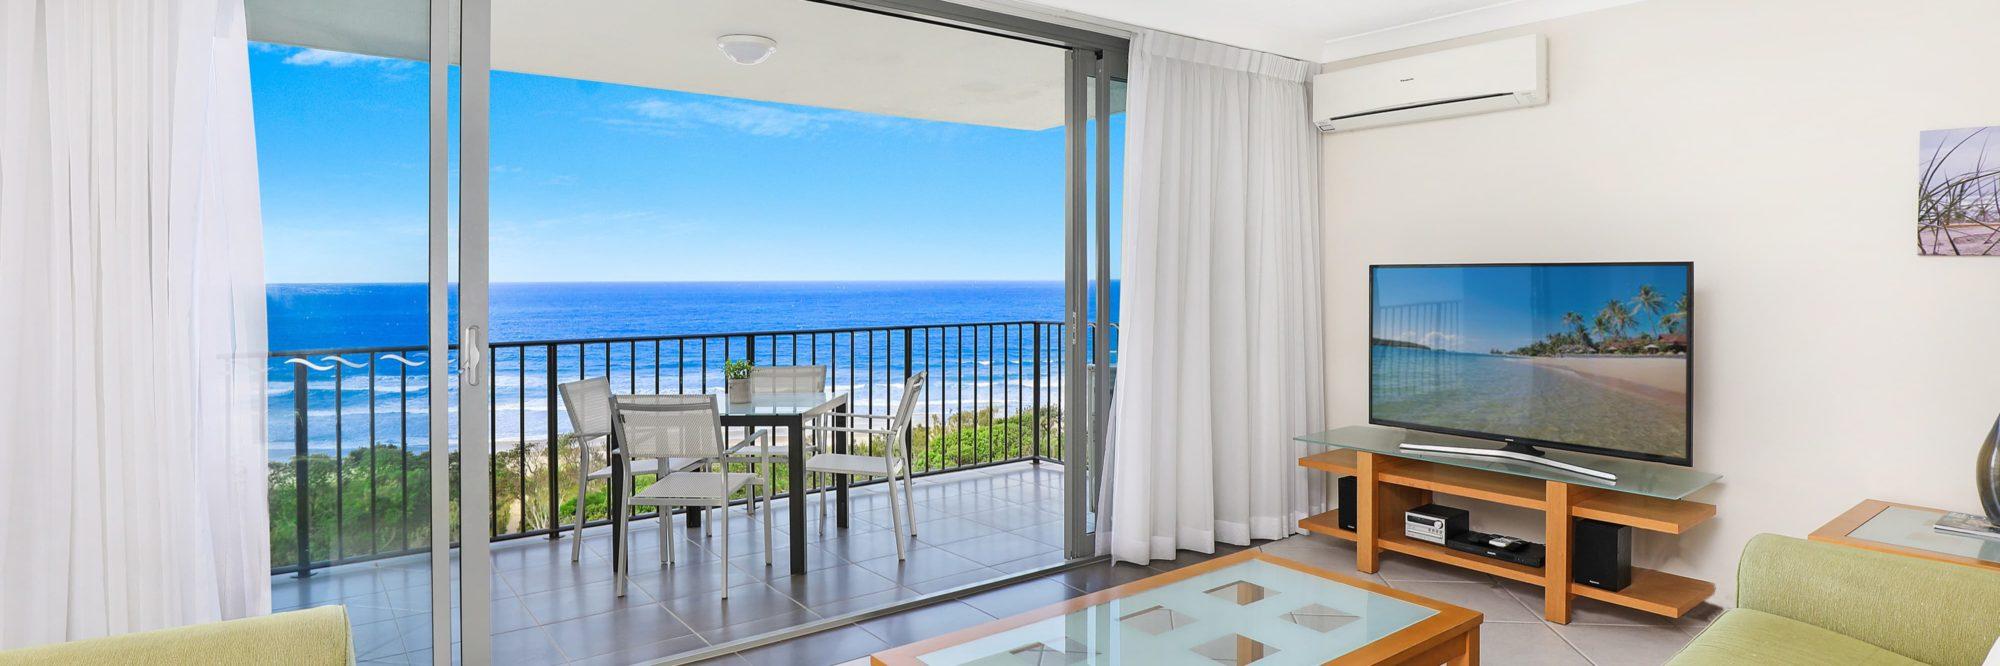 Maroochydore Holiday Apartments | Majorca Isle